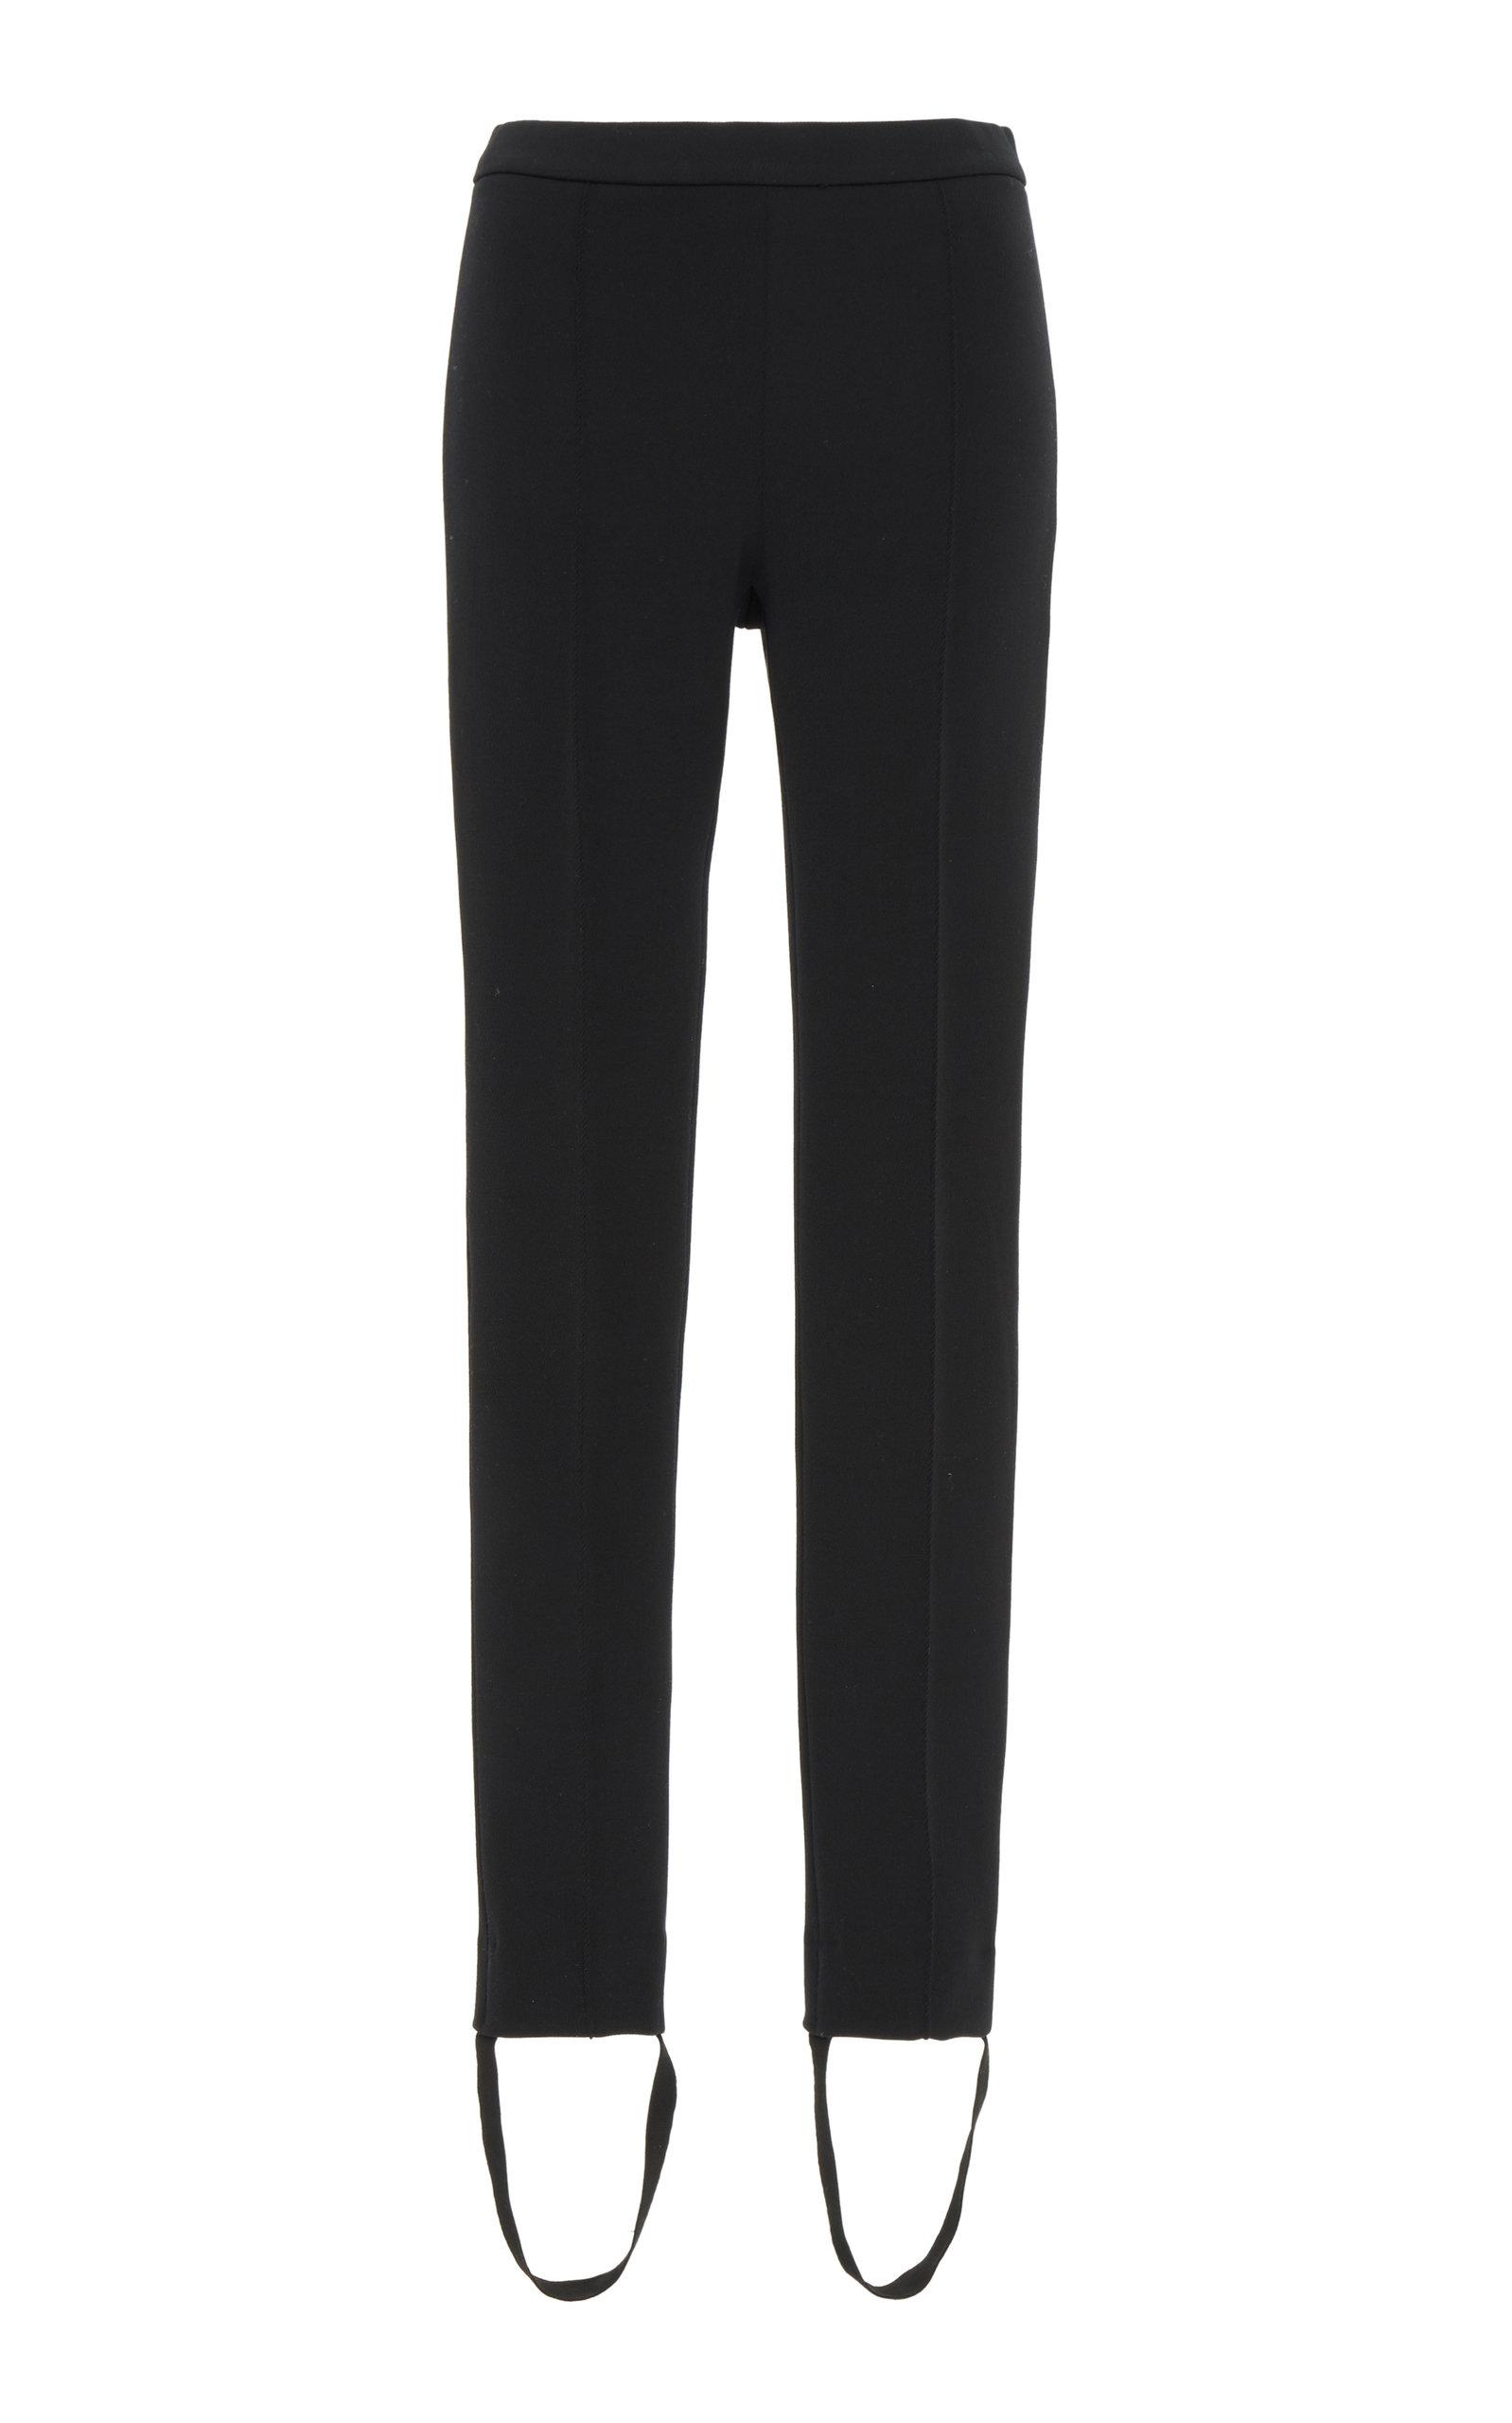 Givenchy Pants Stretch-Twill Stirrup Pants